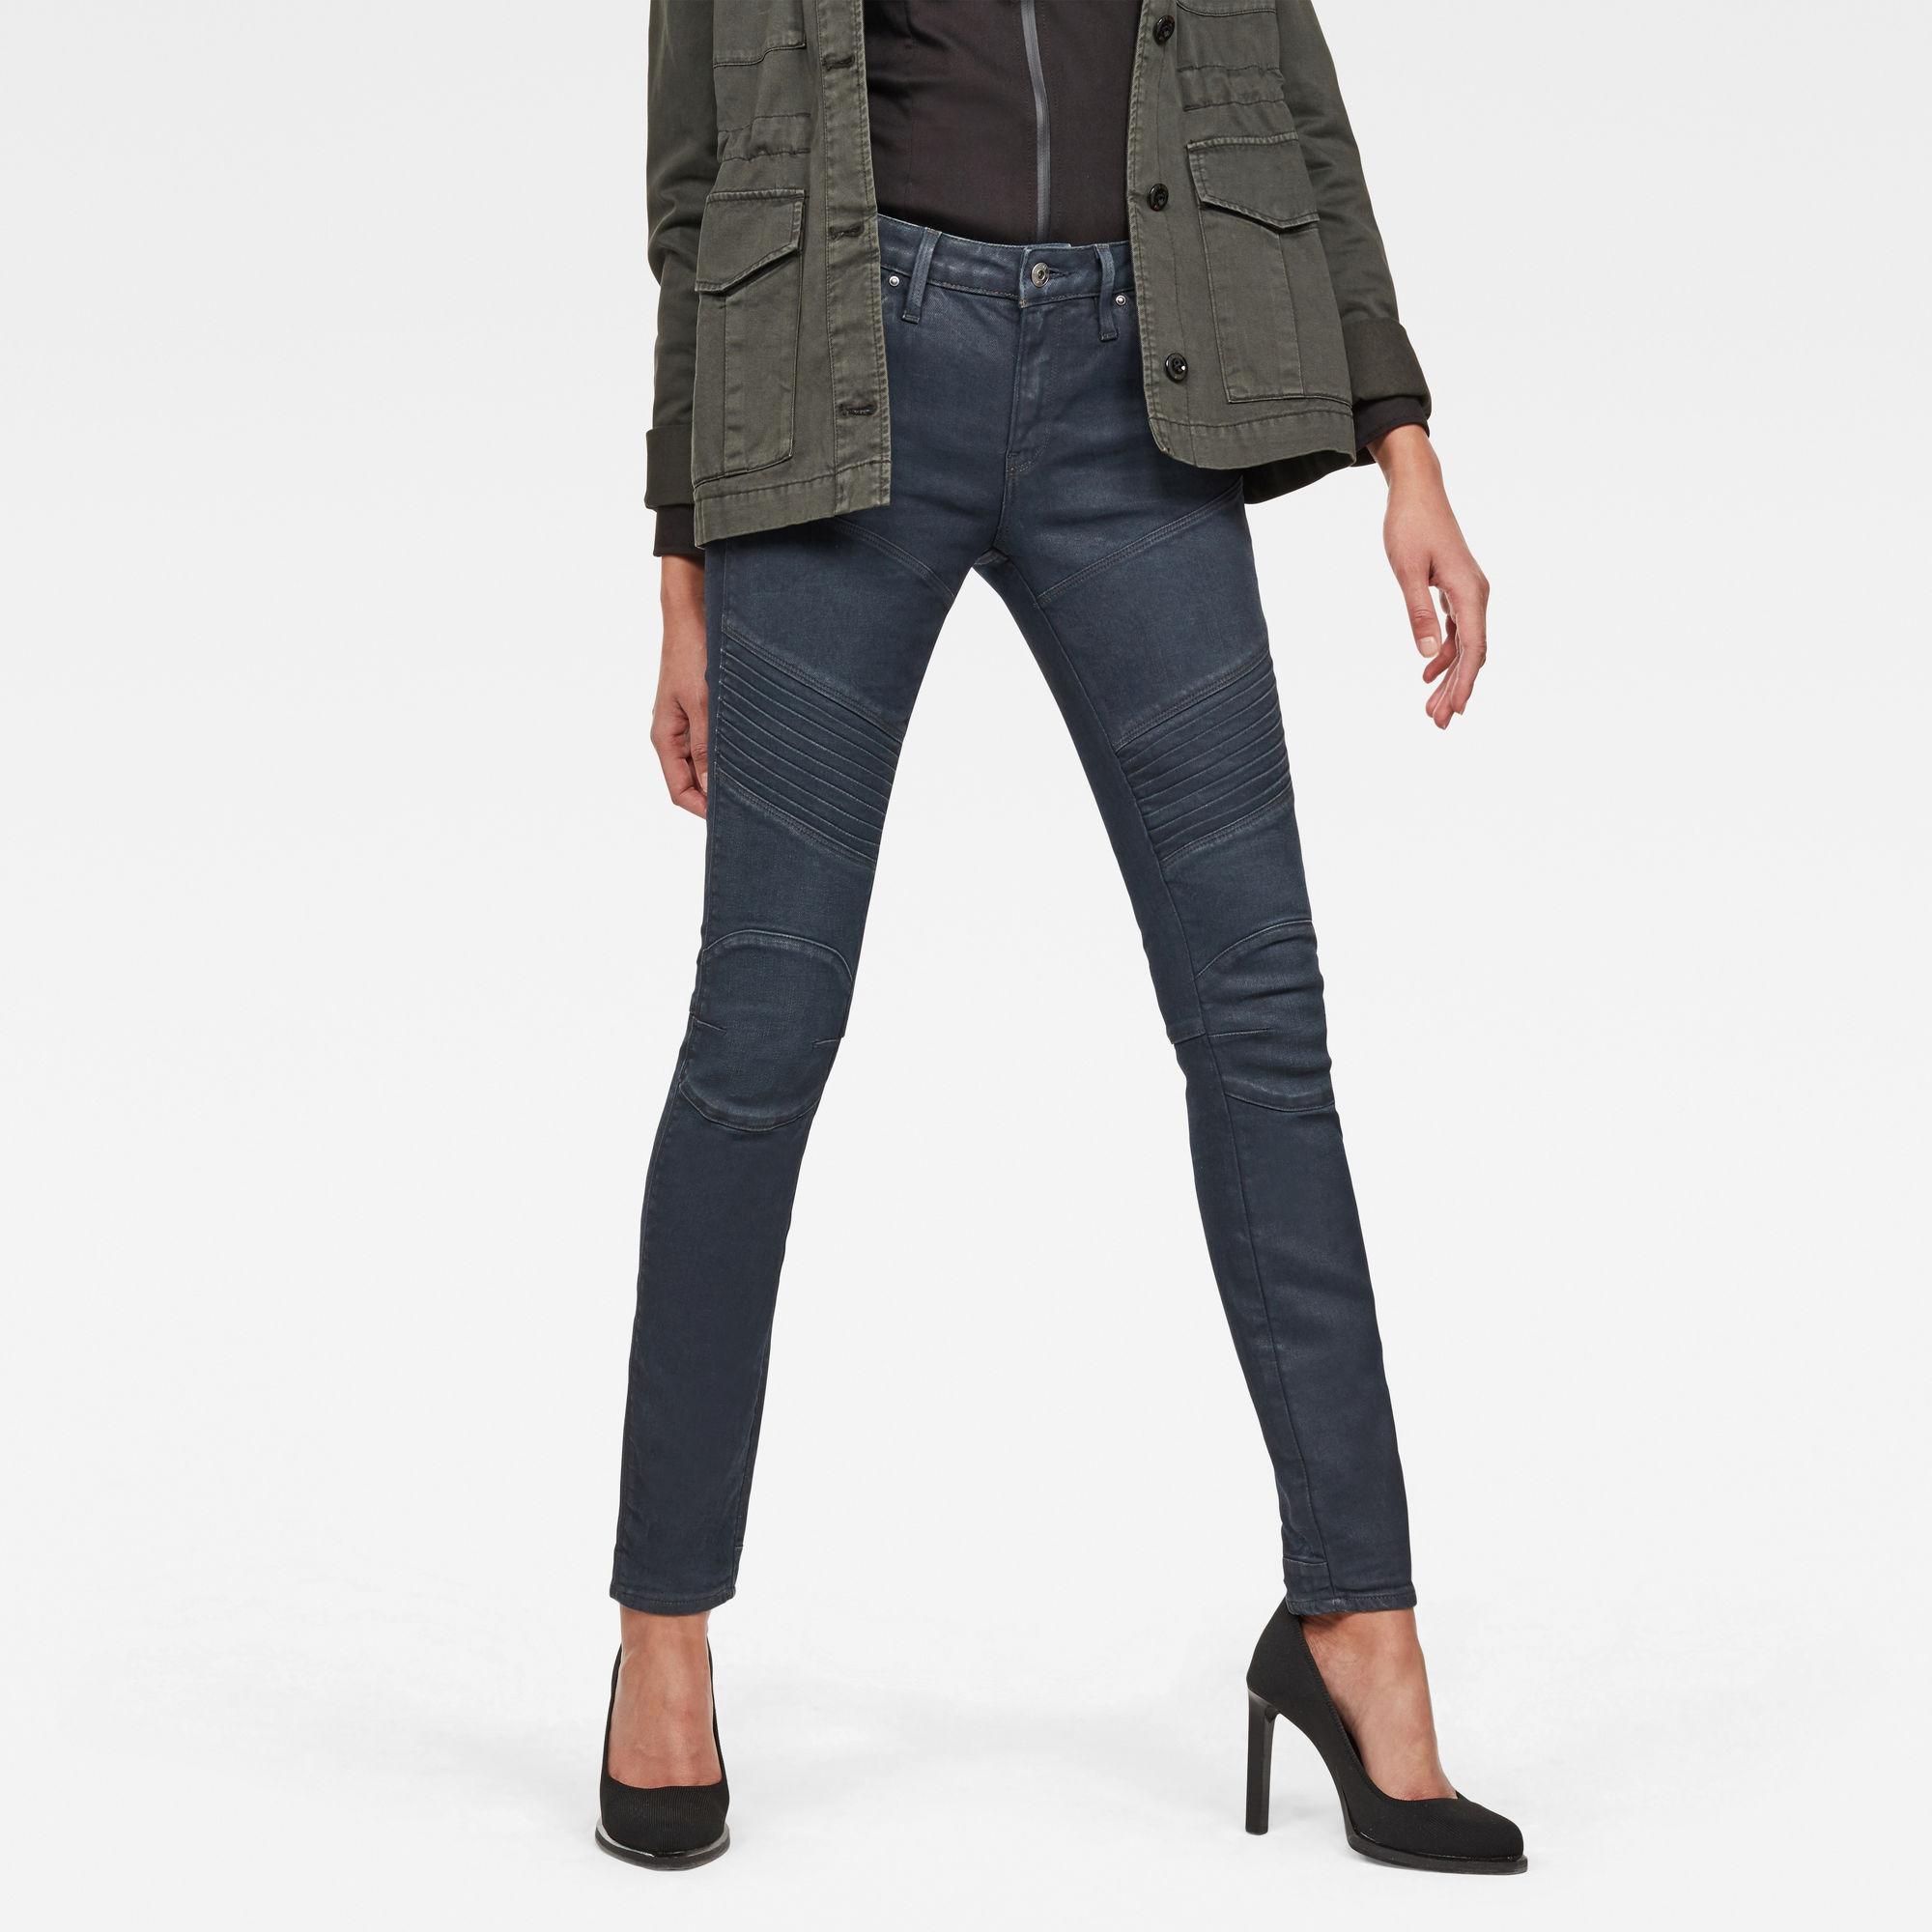 Image of G Star Raw 5620 G-Star Elwood Custom Mid Waist Skinny Jeans